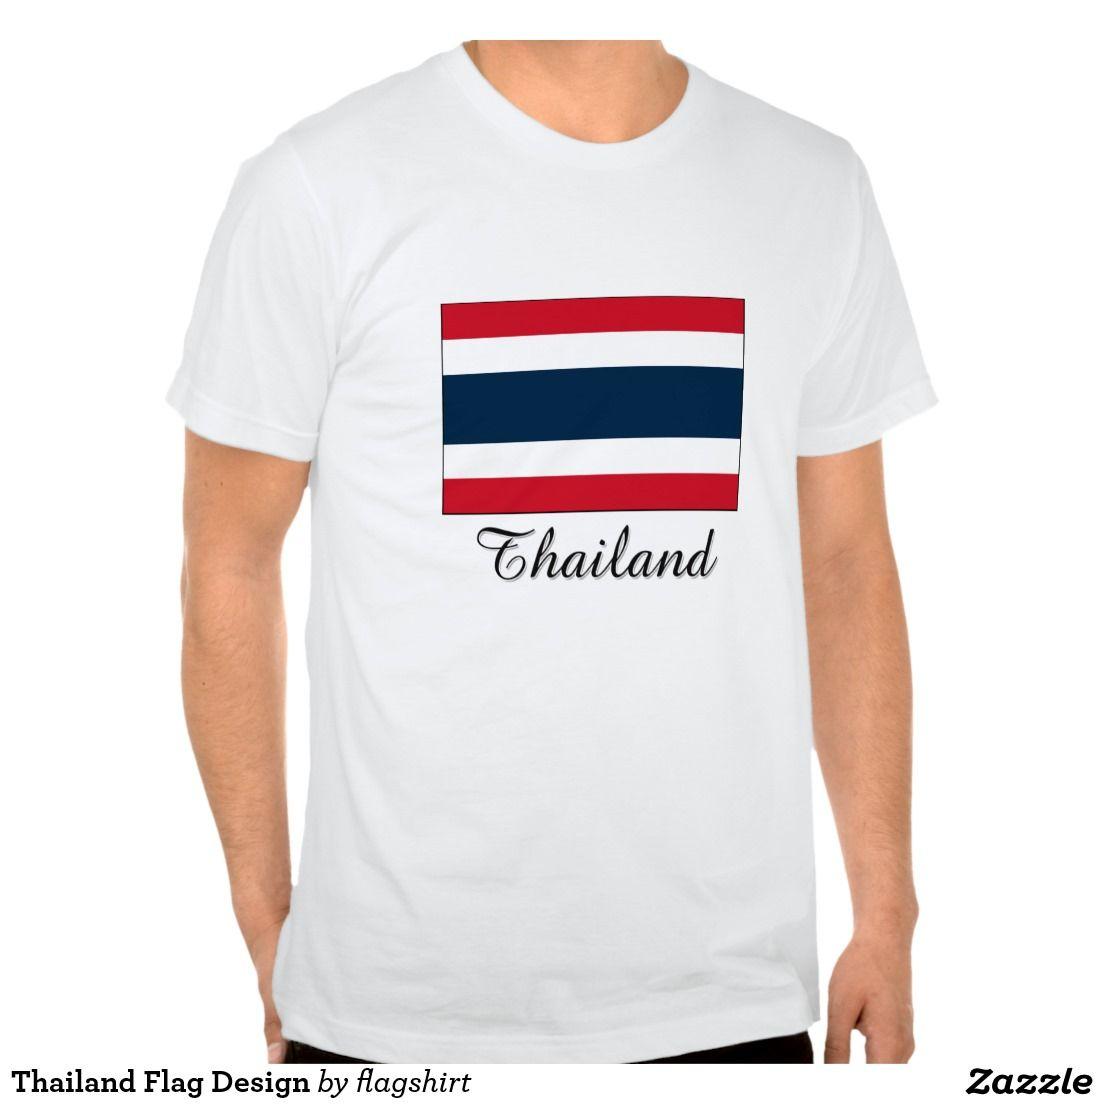 Zazzle t shirt design size - Thailand Flag Design Tee Shirts